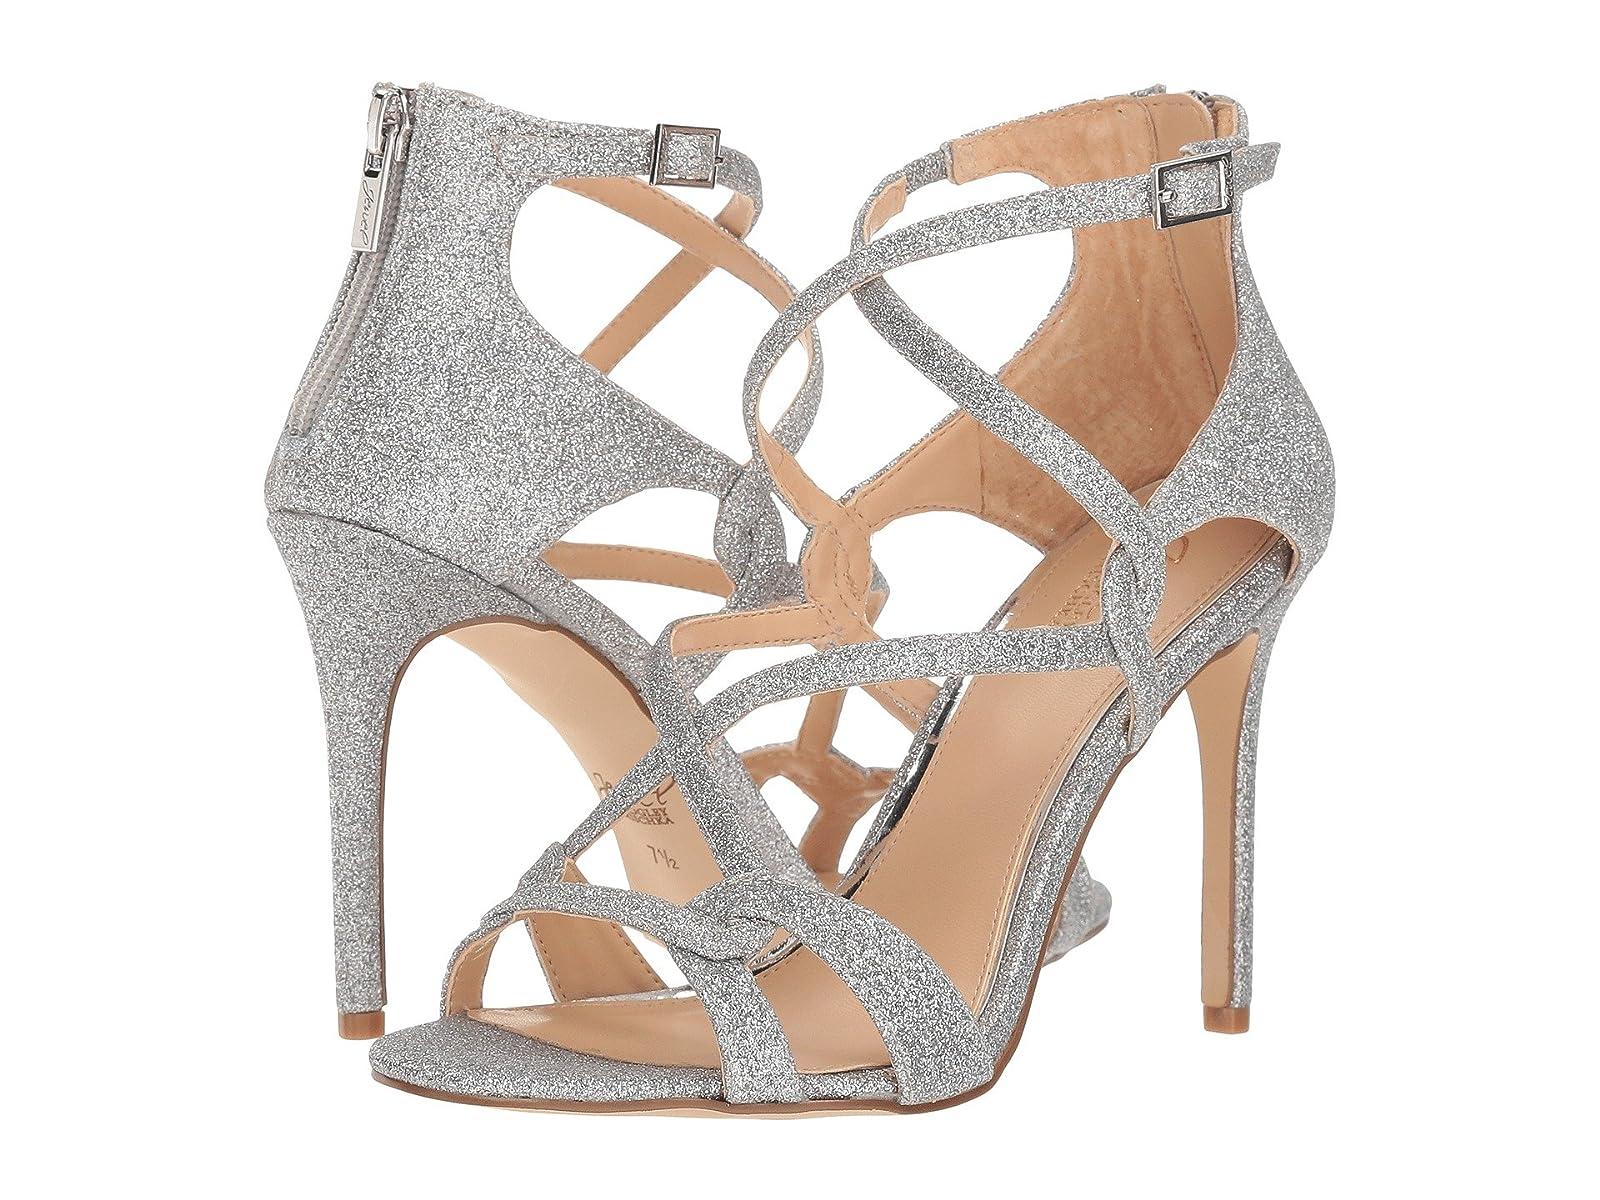 Jewel Badgley Mischka AlizaCheap and distinctive eye-catching shoes